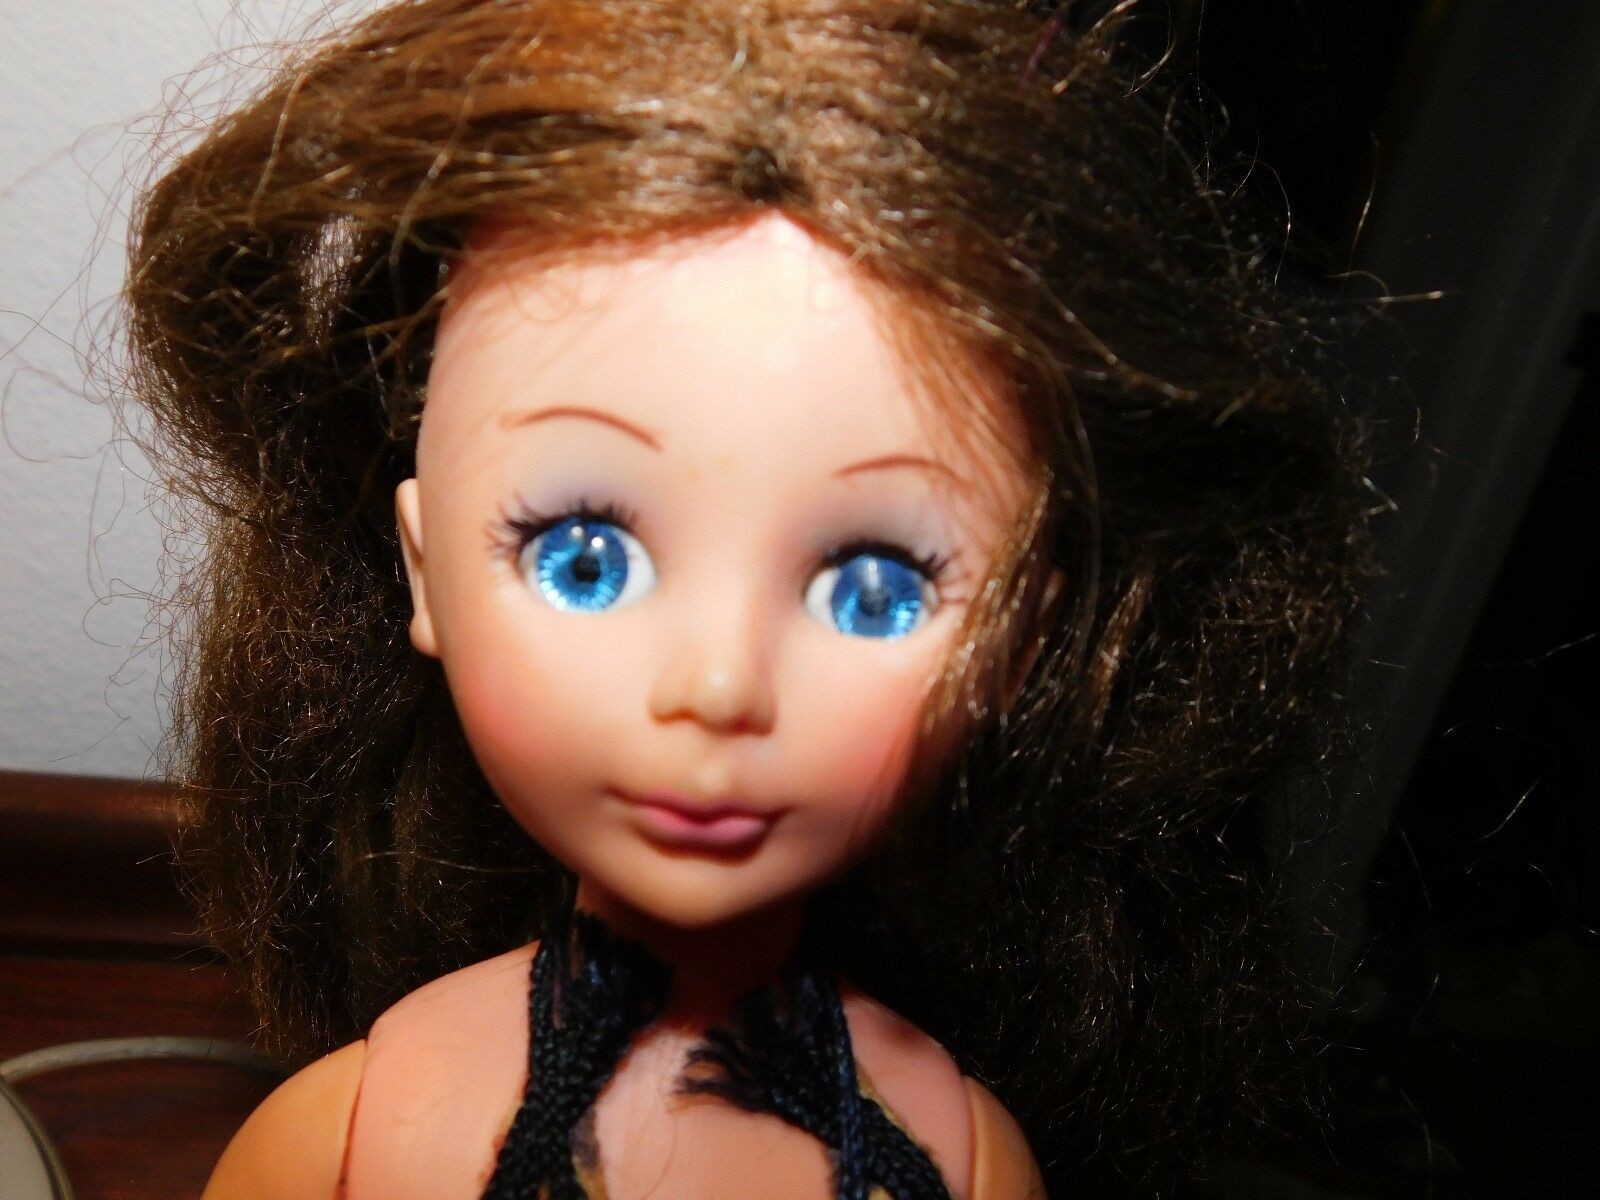 Vintage 1972 Uneeda 14 Brunette Clover Doll Sleep Eyes Hong Kong - $61.75